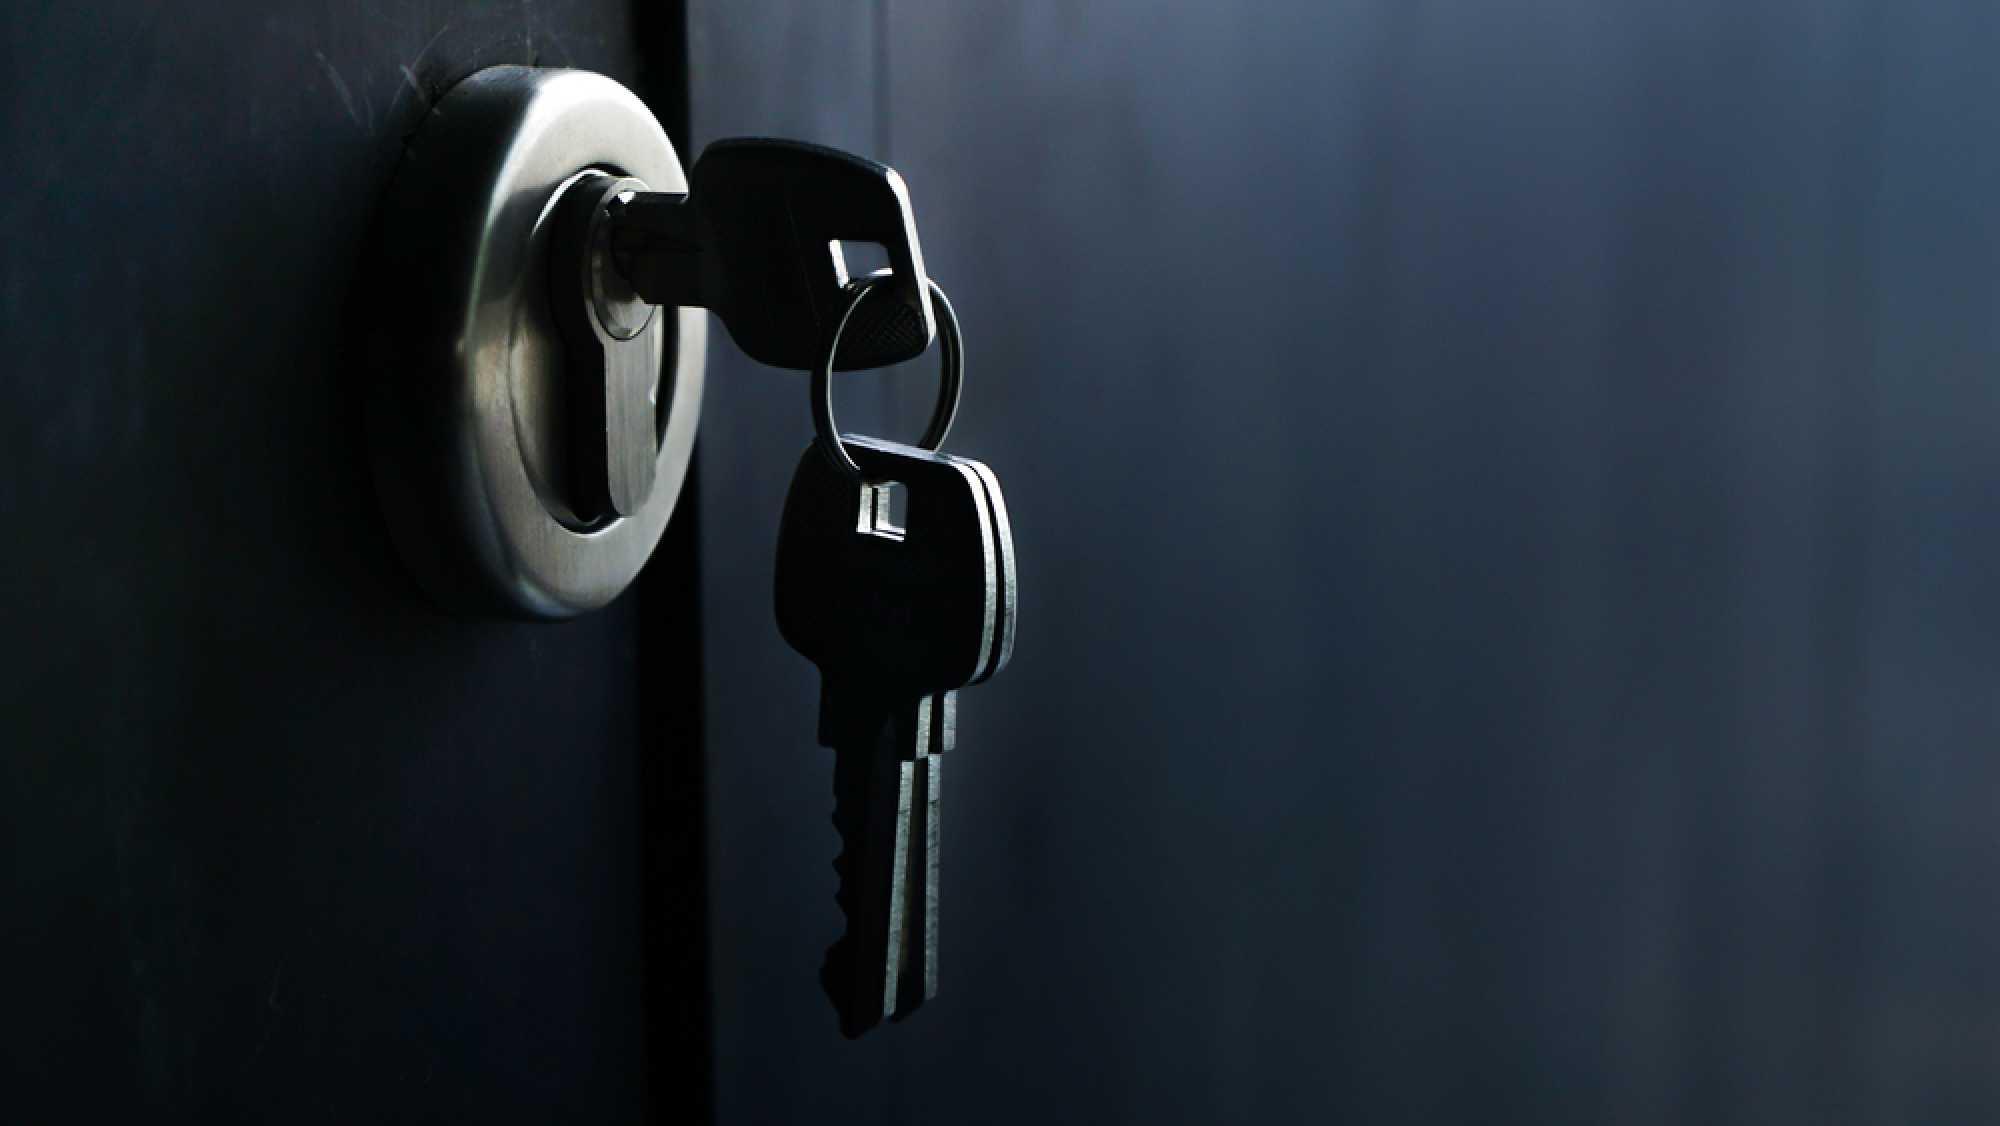 OpenSSH 8.2: Authentifizierung ohne Passwort dank U2F/FIDO